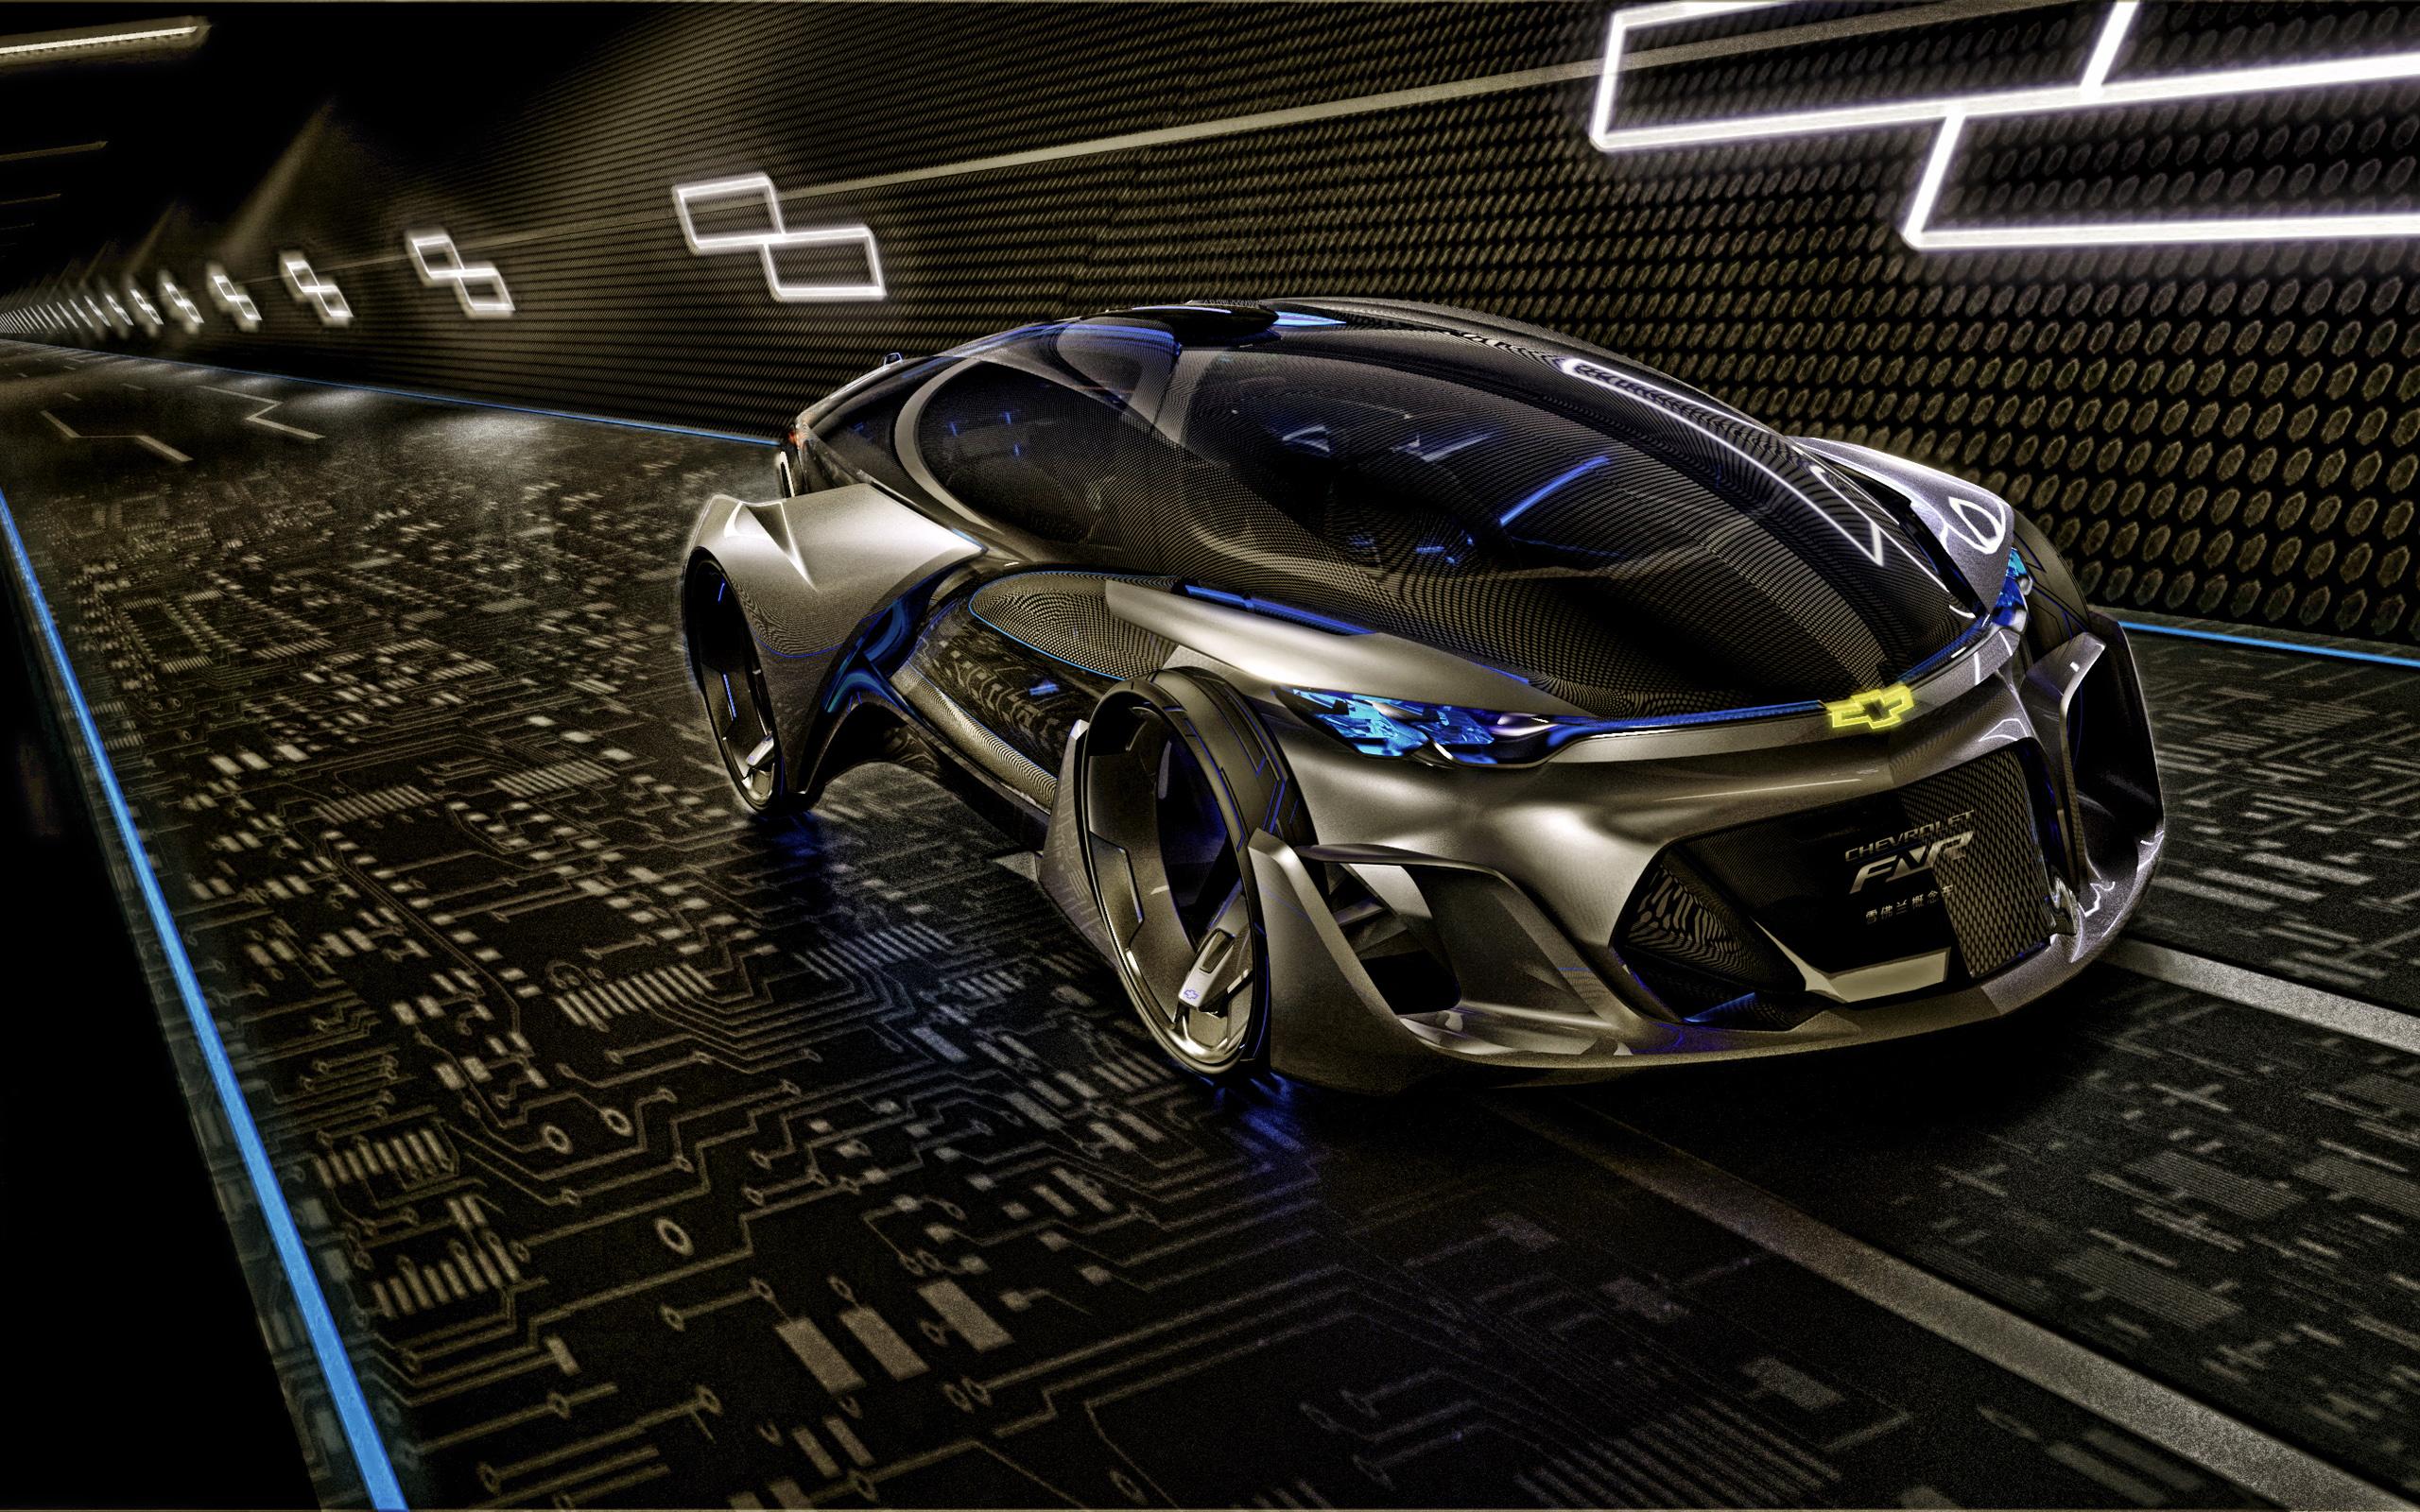 2015 Chevrolet FNR Concept Wallpaper | HD Car Wallpapers ...